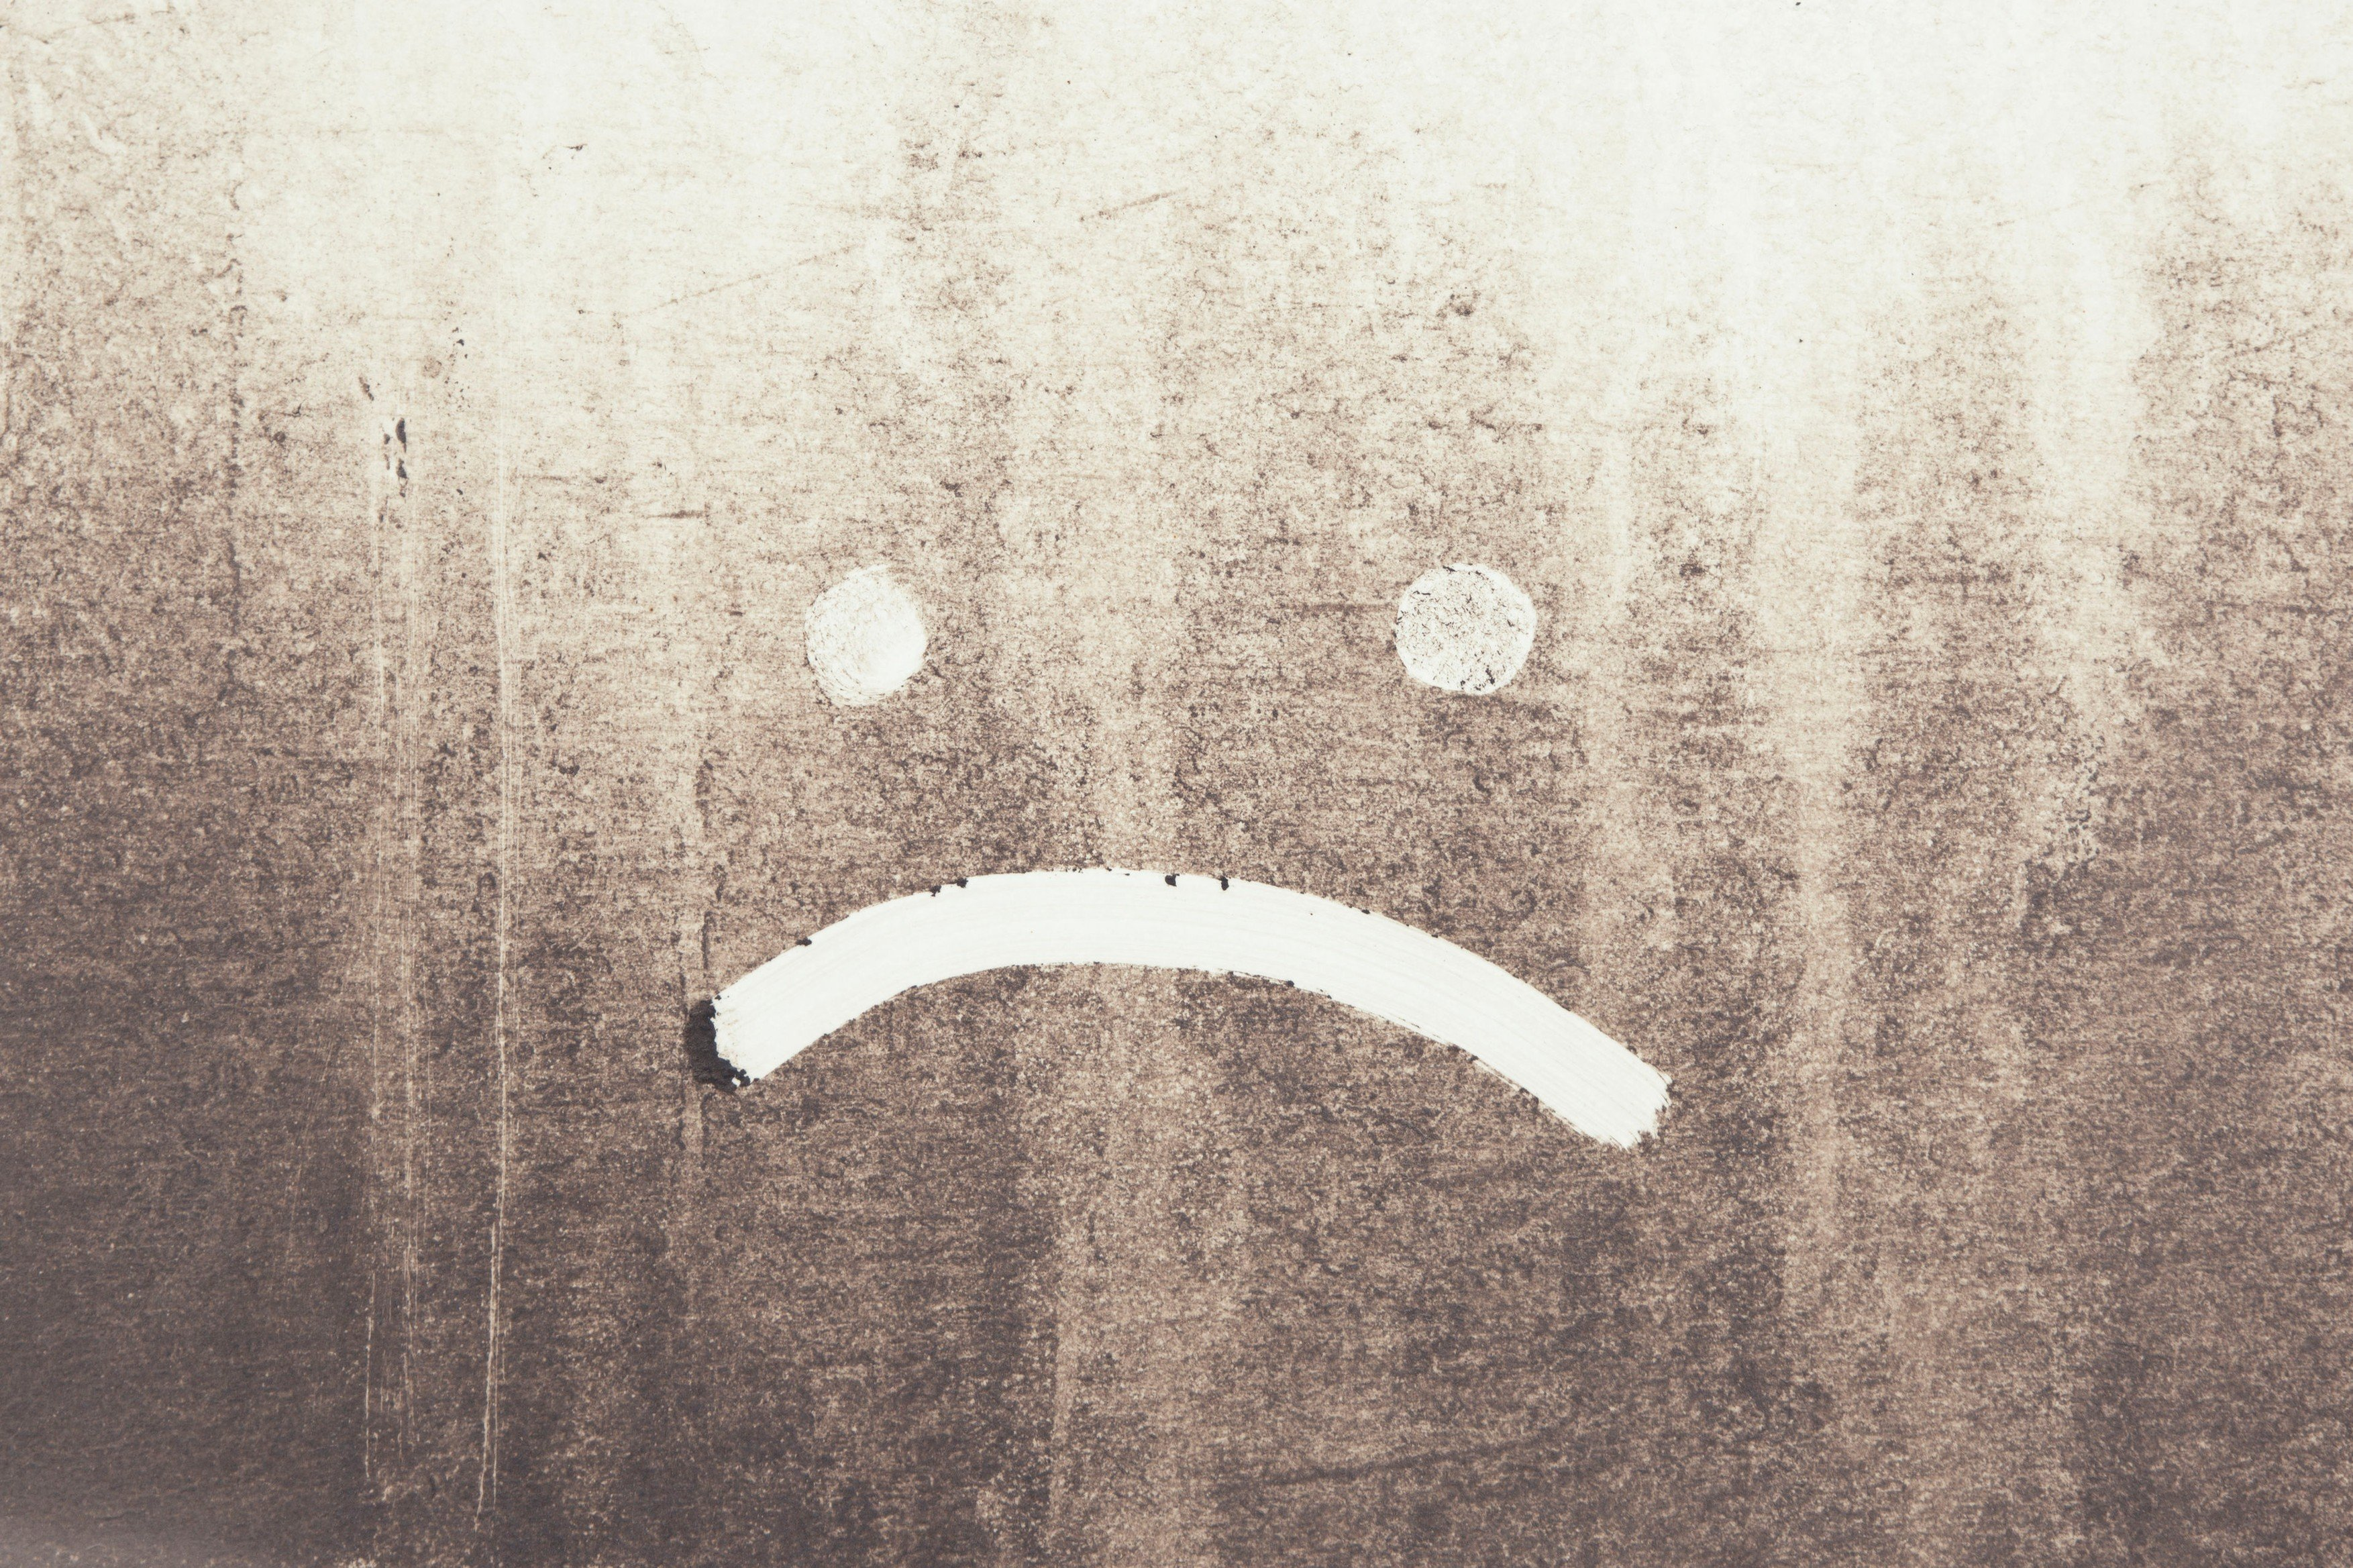 Prach, špína, smutný smajlík, deprese. Ilustrační foto